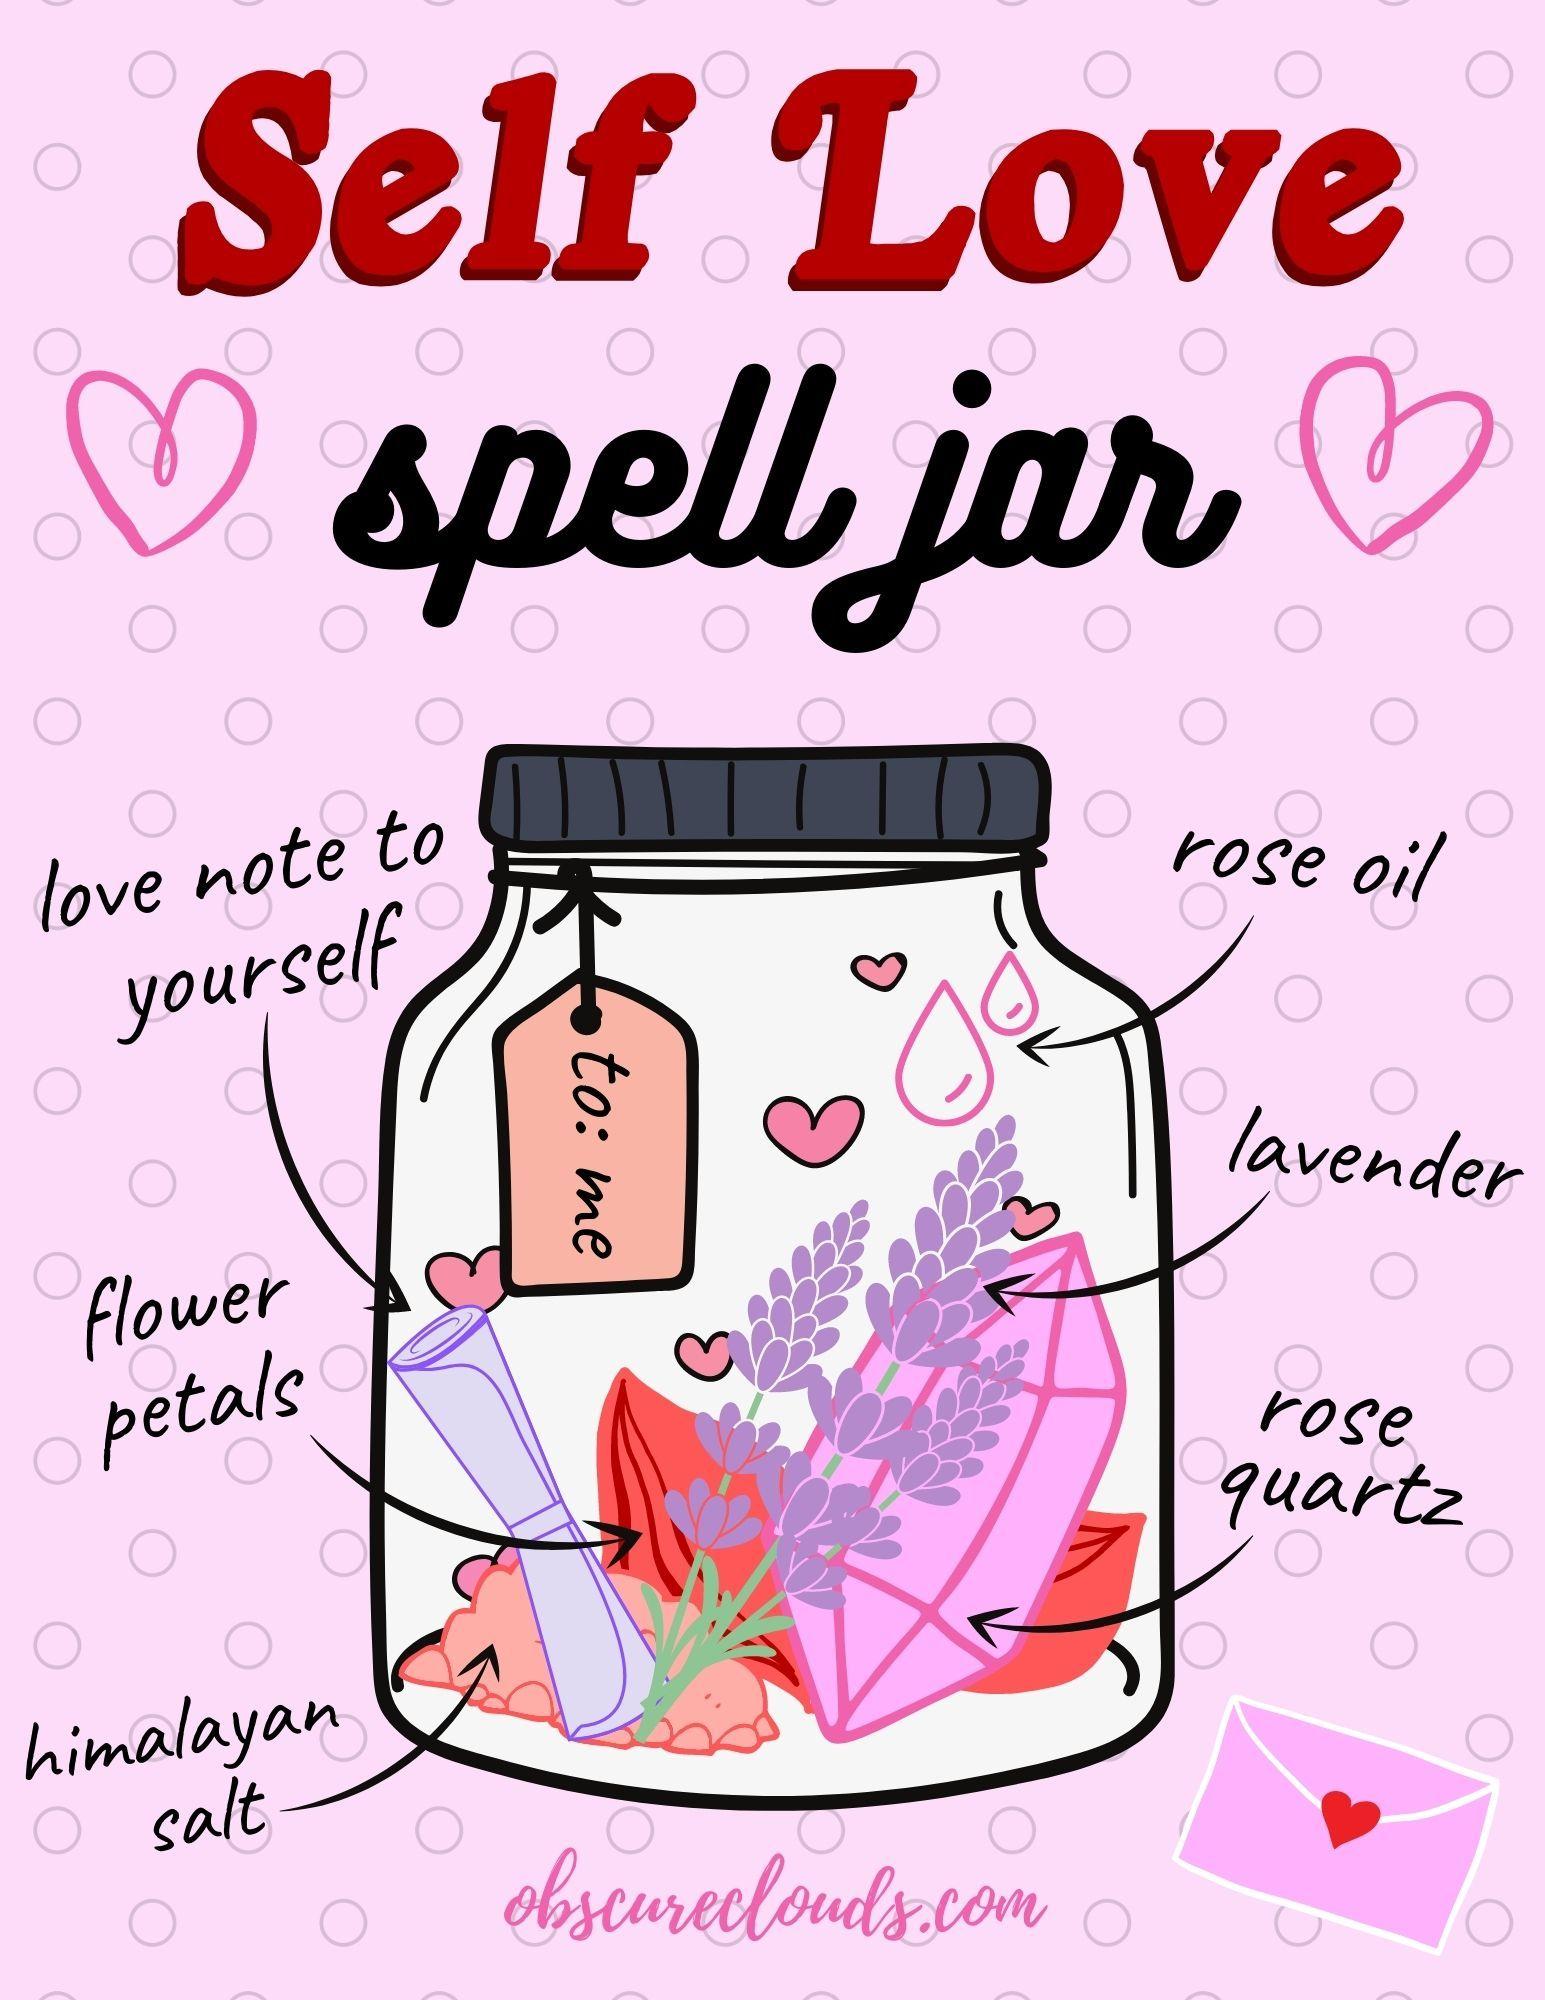 Self-Love Spell Jar!